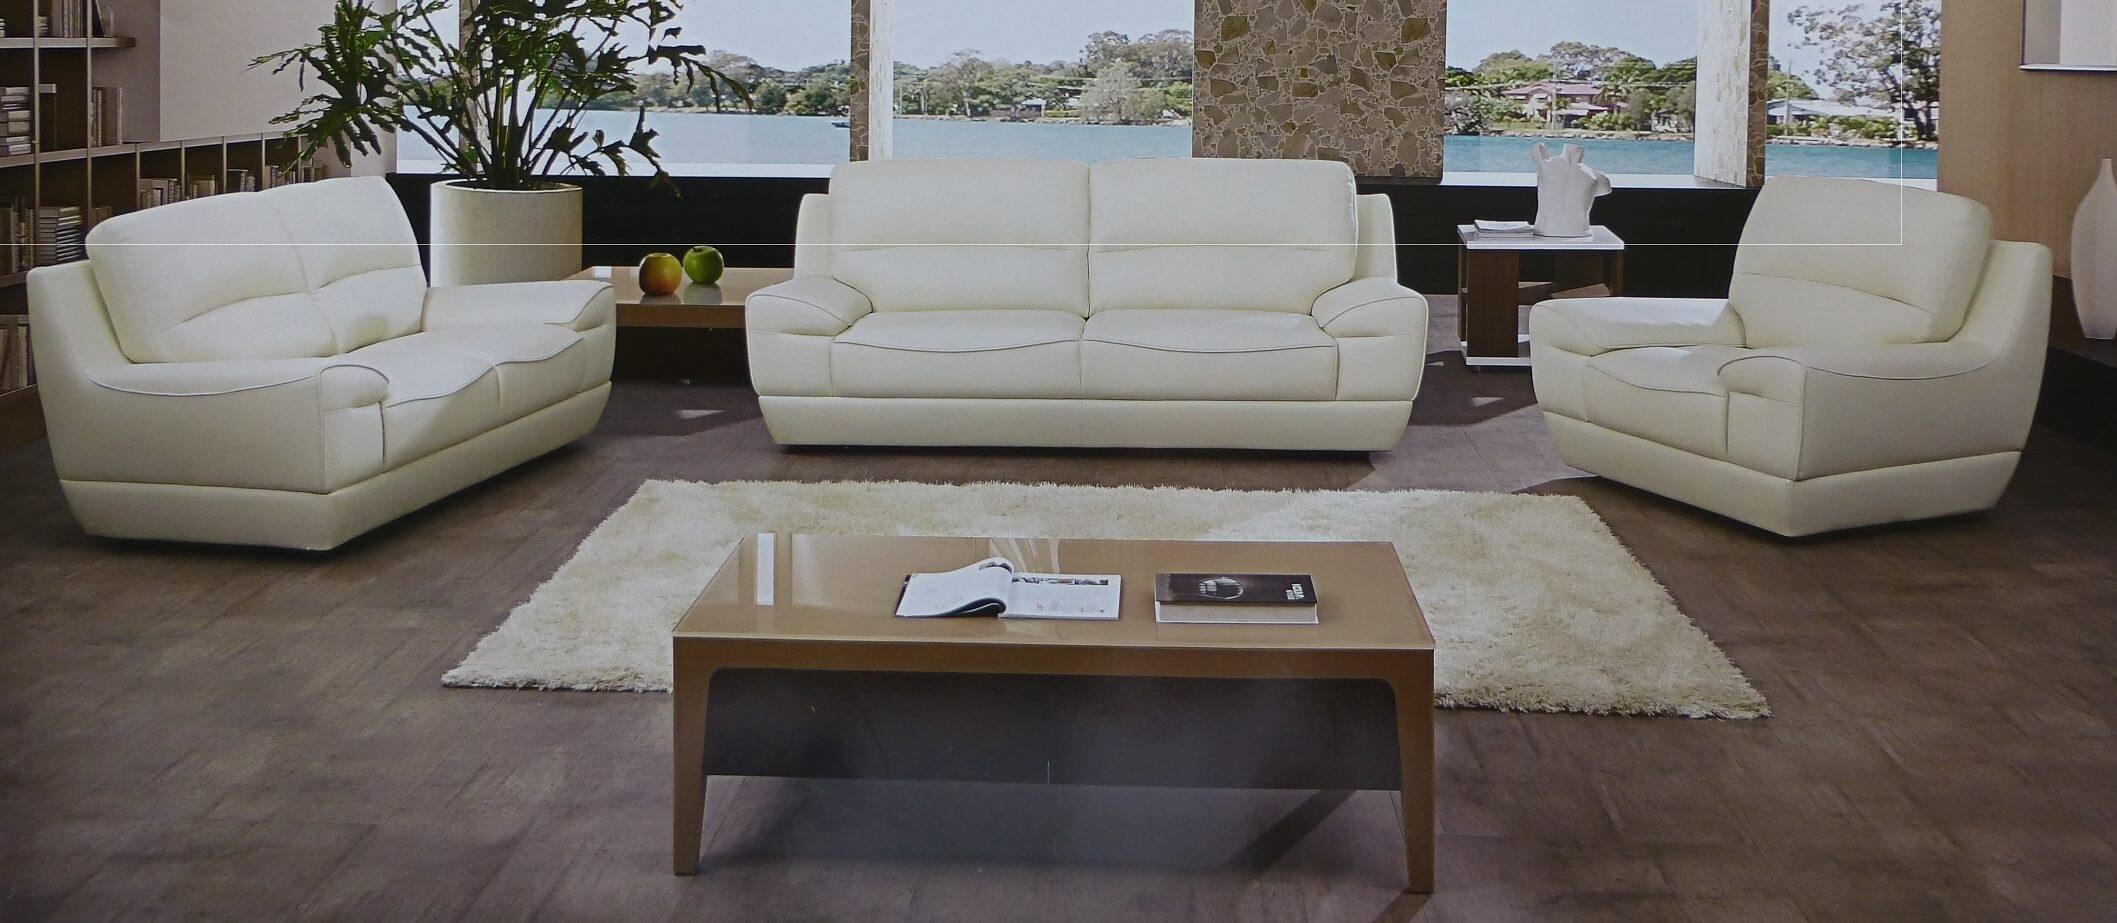 Sofa: Designs White Sofa And Loveseat White Sofa And Loveseat Set In Off White Leather Sofas (View 5 of 10)